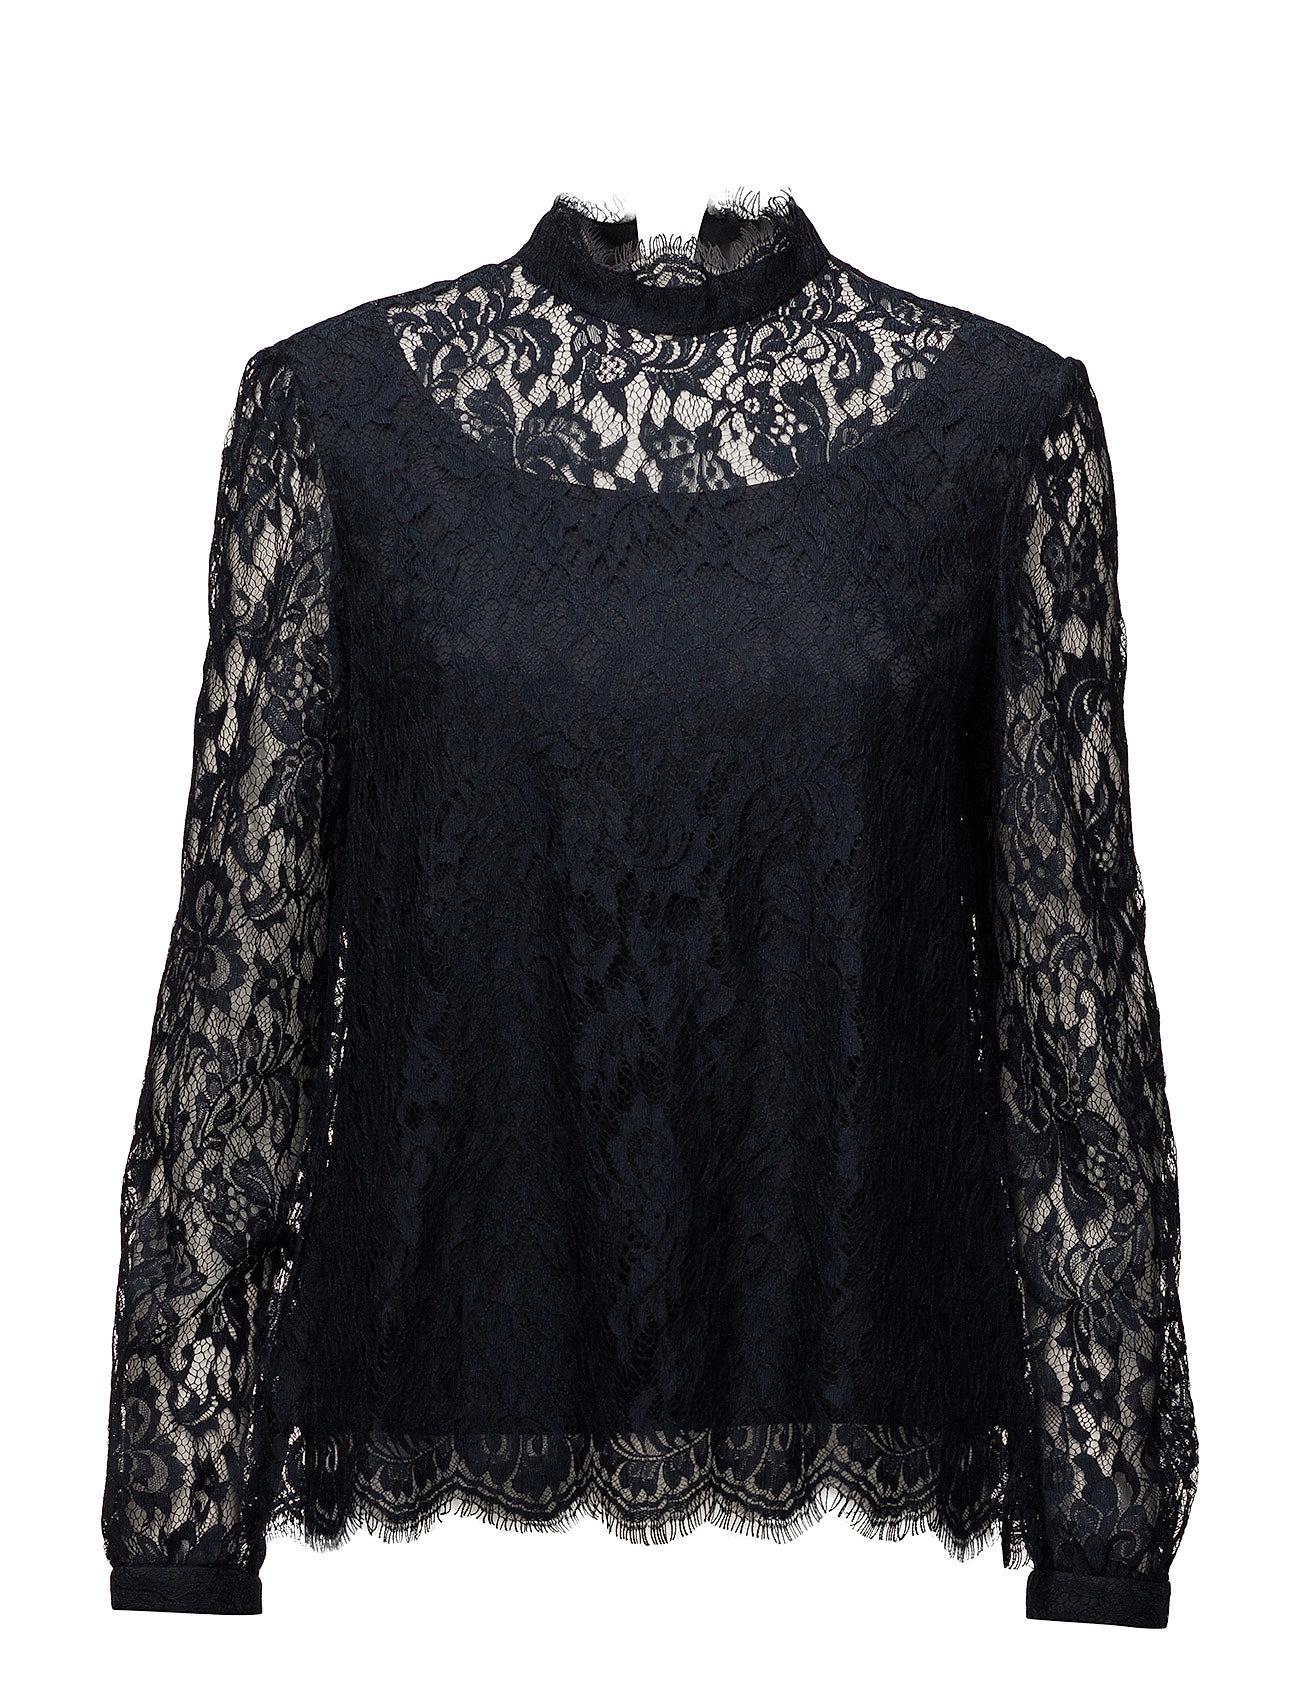 ida sjã¶stedt Keri blouse på boozt.com dk